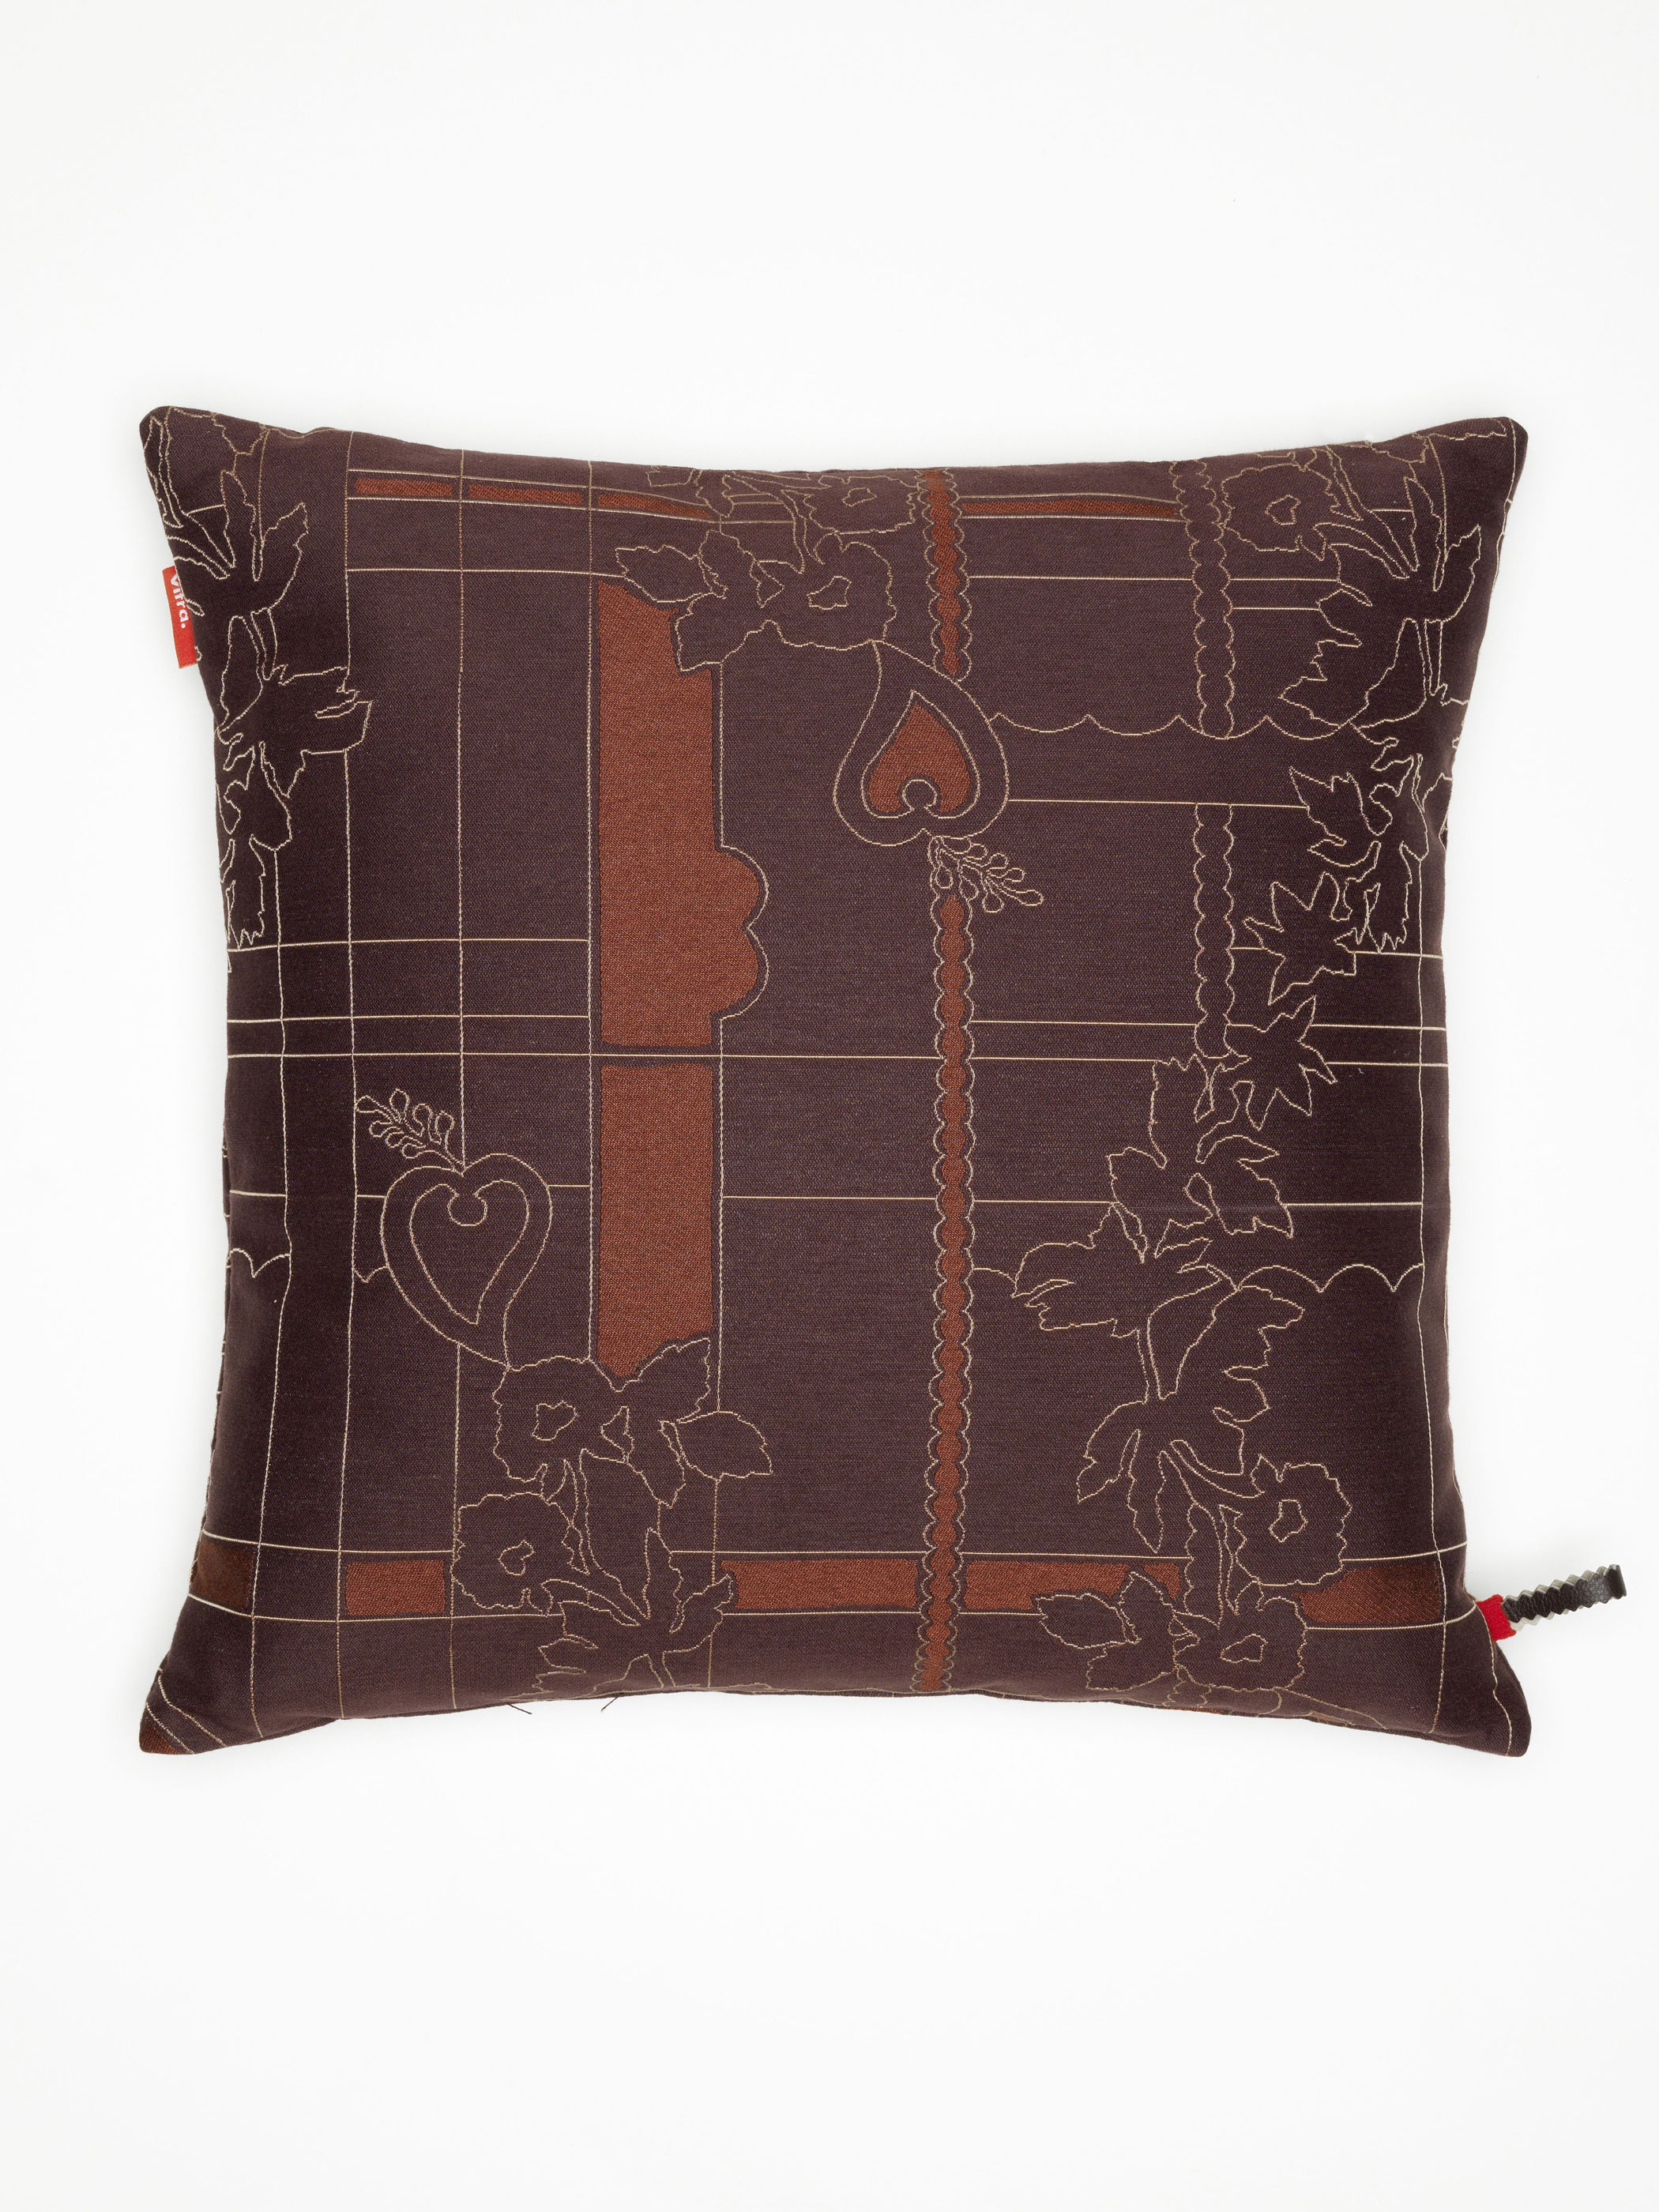 vitra kissen maharam park woven cayenne syrah produktdetails. Black Bedroom Furniture Sets. Home Design Ideas